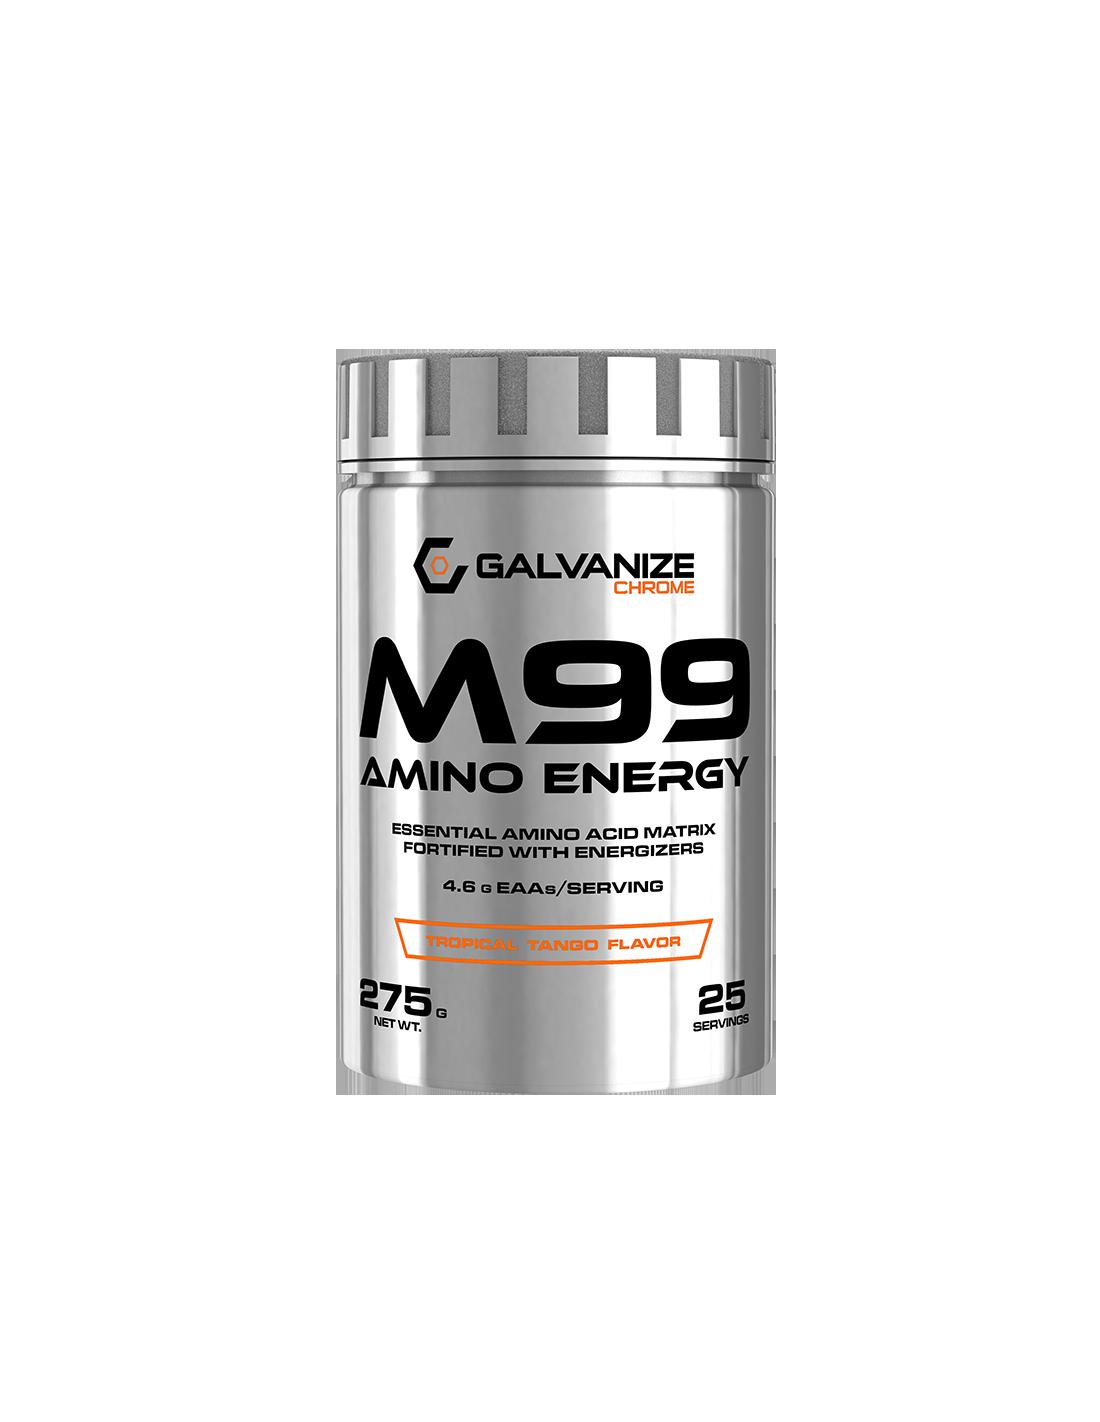 Galvanize Аминокислотный комплекс M99 Amino Energy